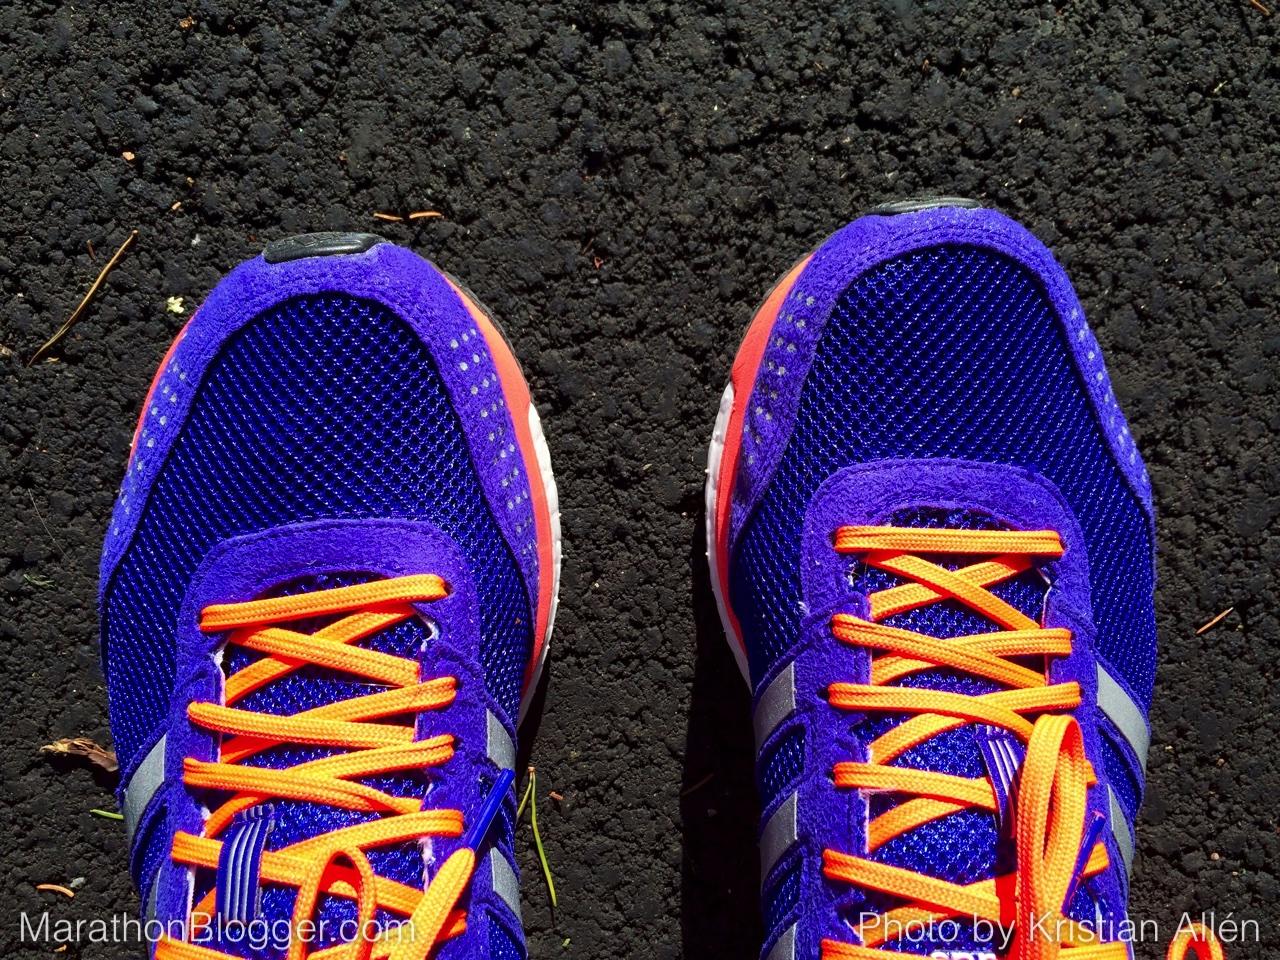 13.8.2015 7.01 km Run